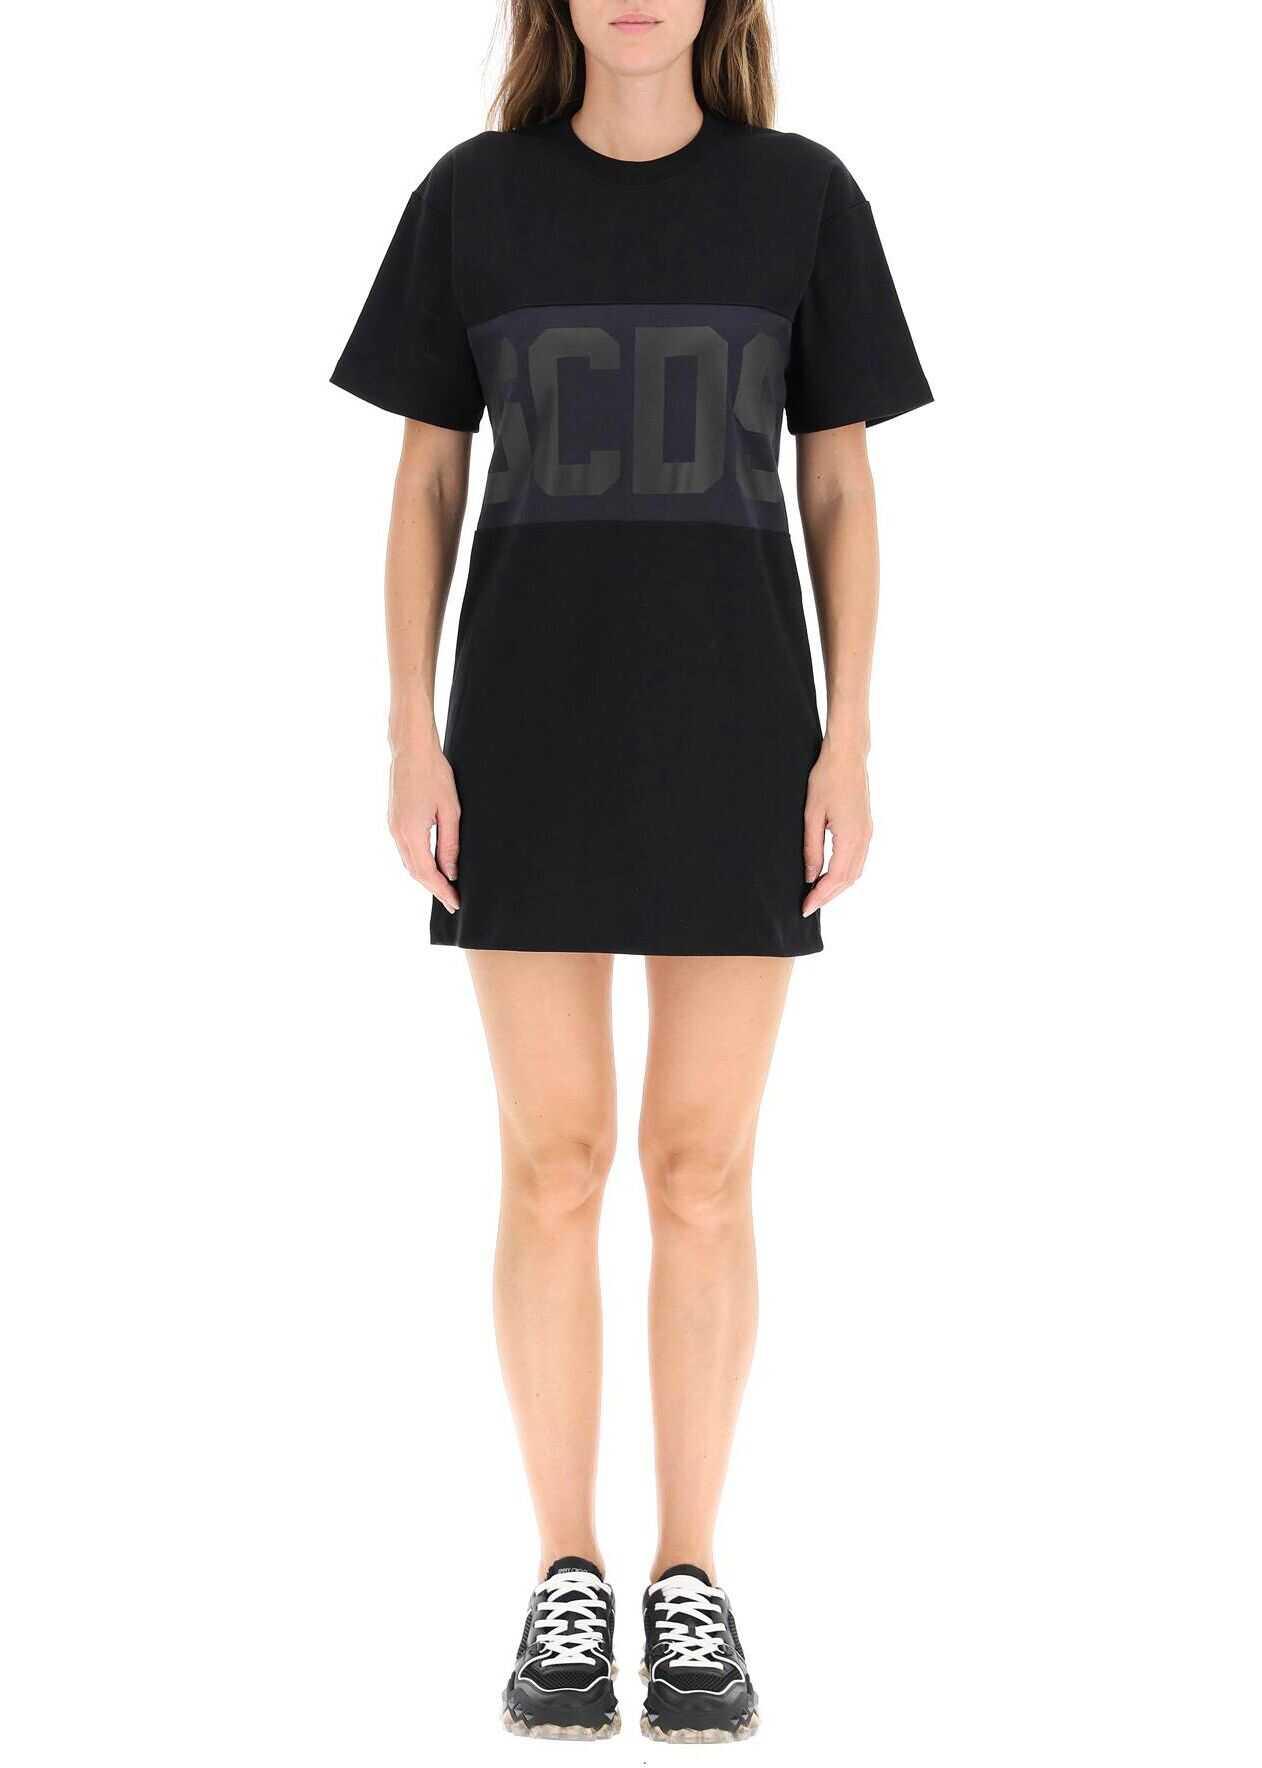 GCDS Logo Band T-Shirt Dress CC94W020510 BLACK image0